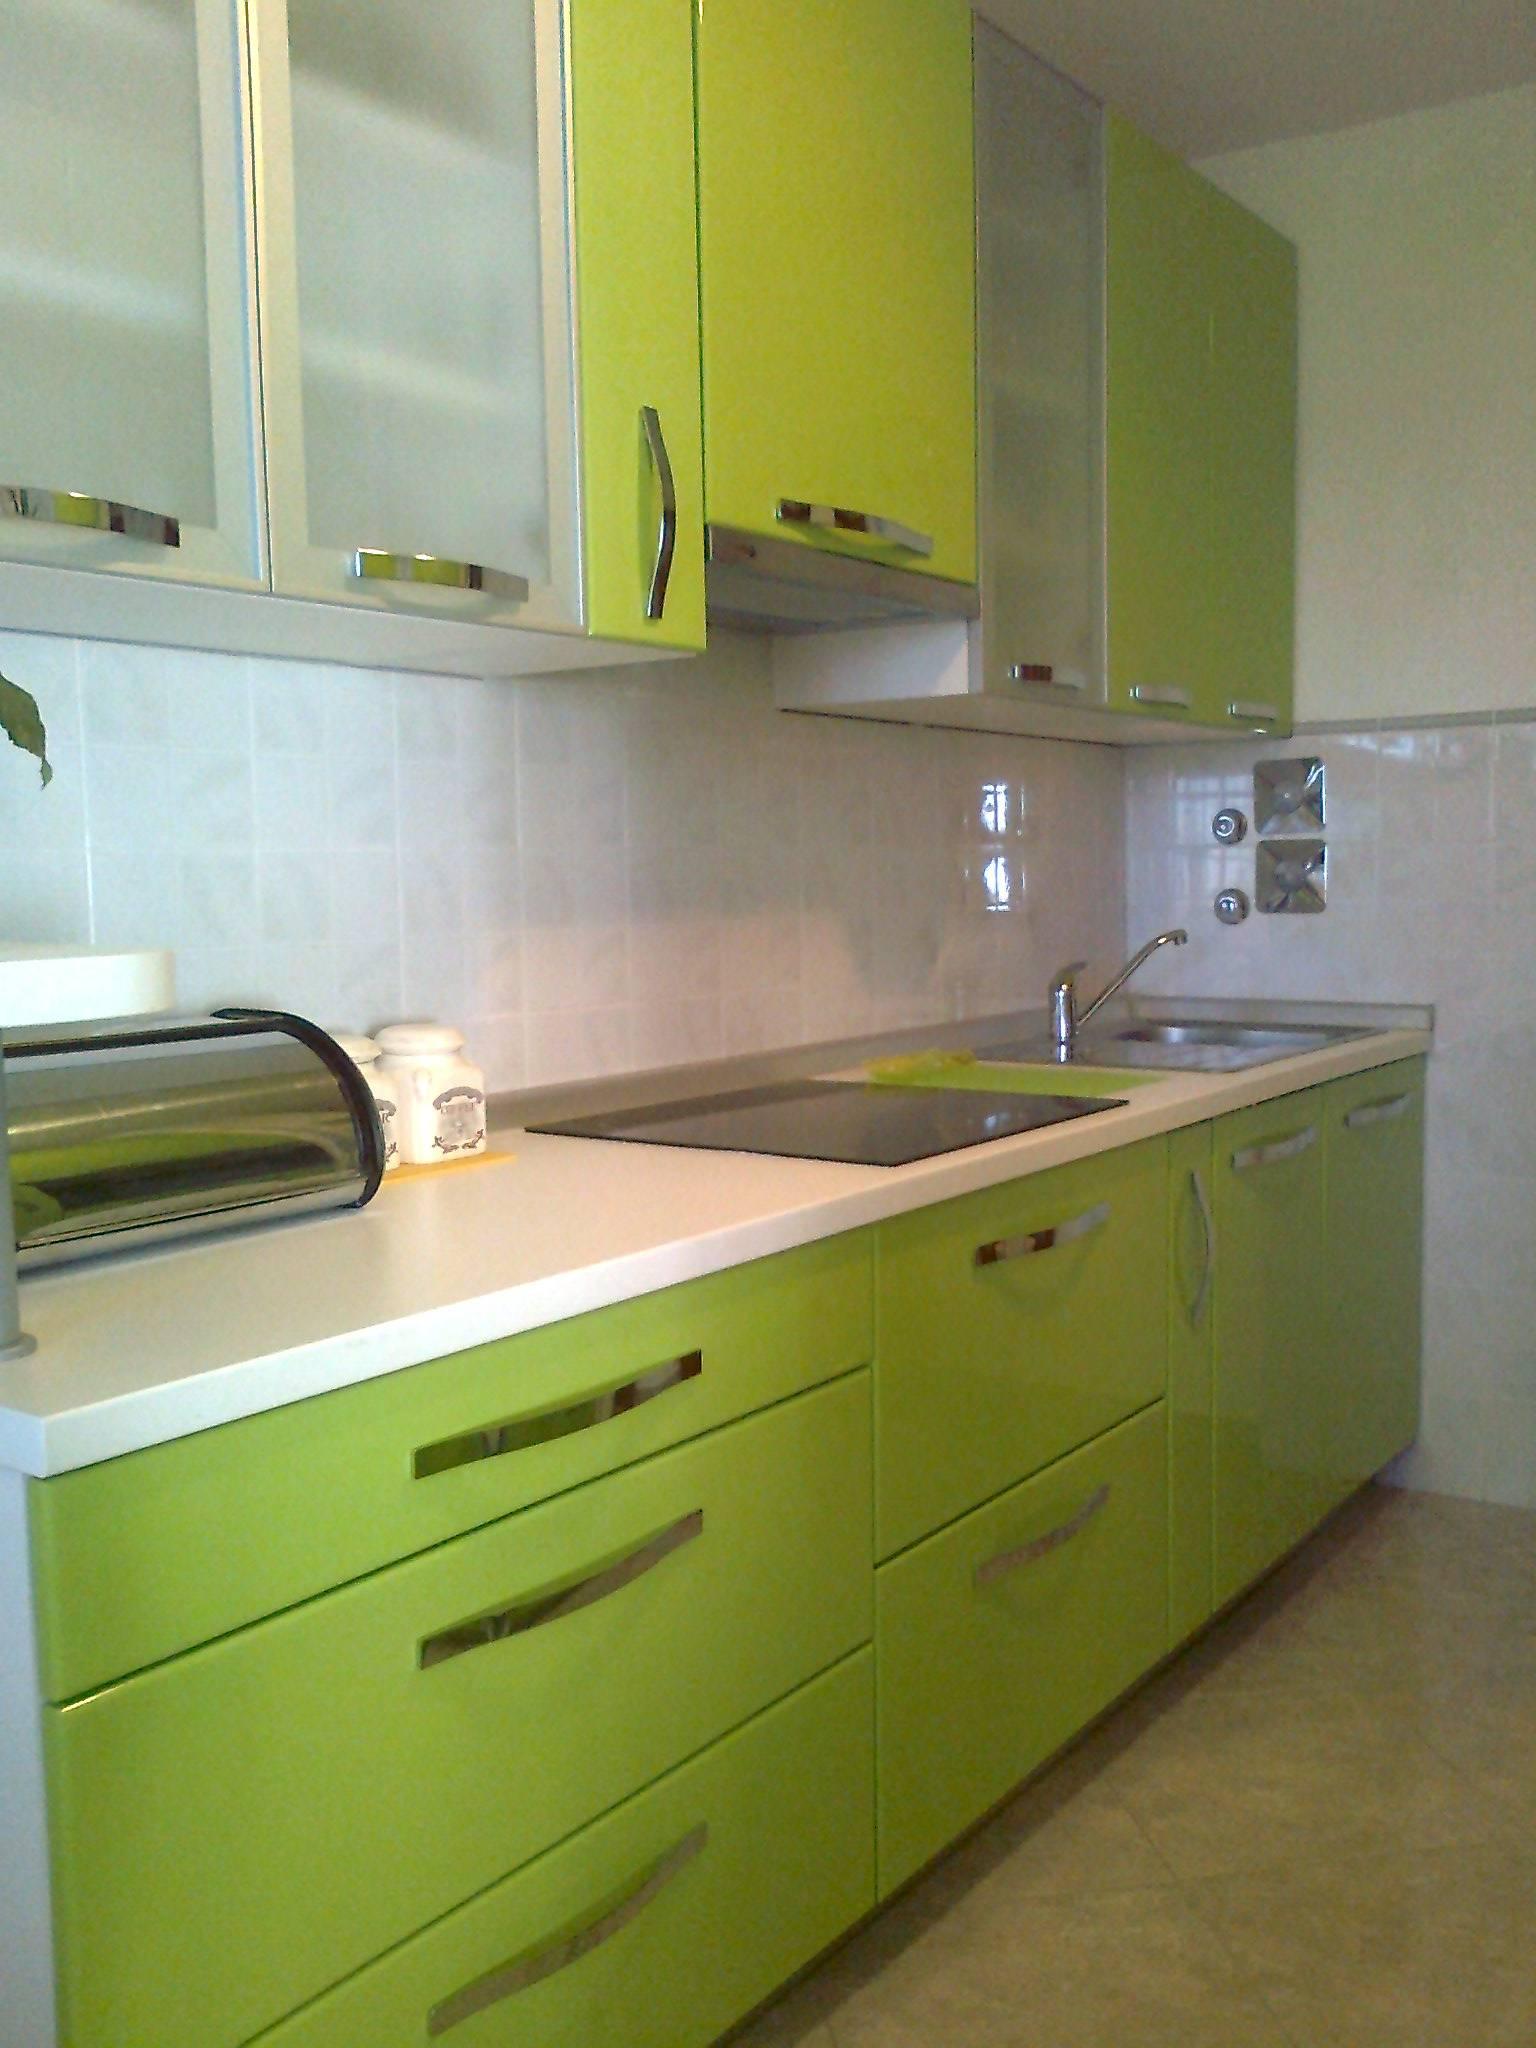 posjetite www.saric.kitchen - kuhinje šarić